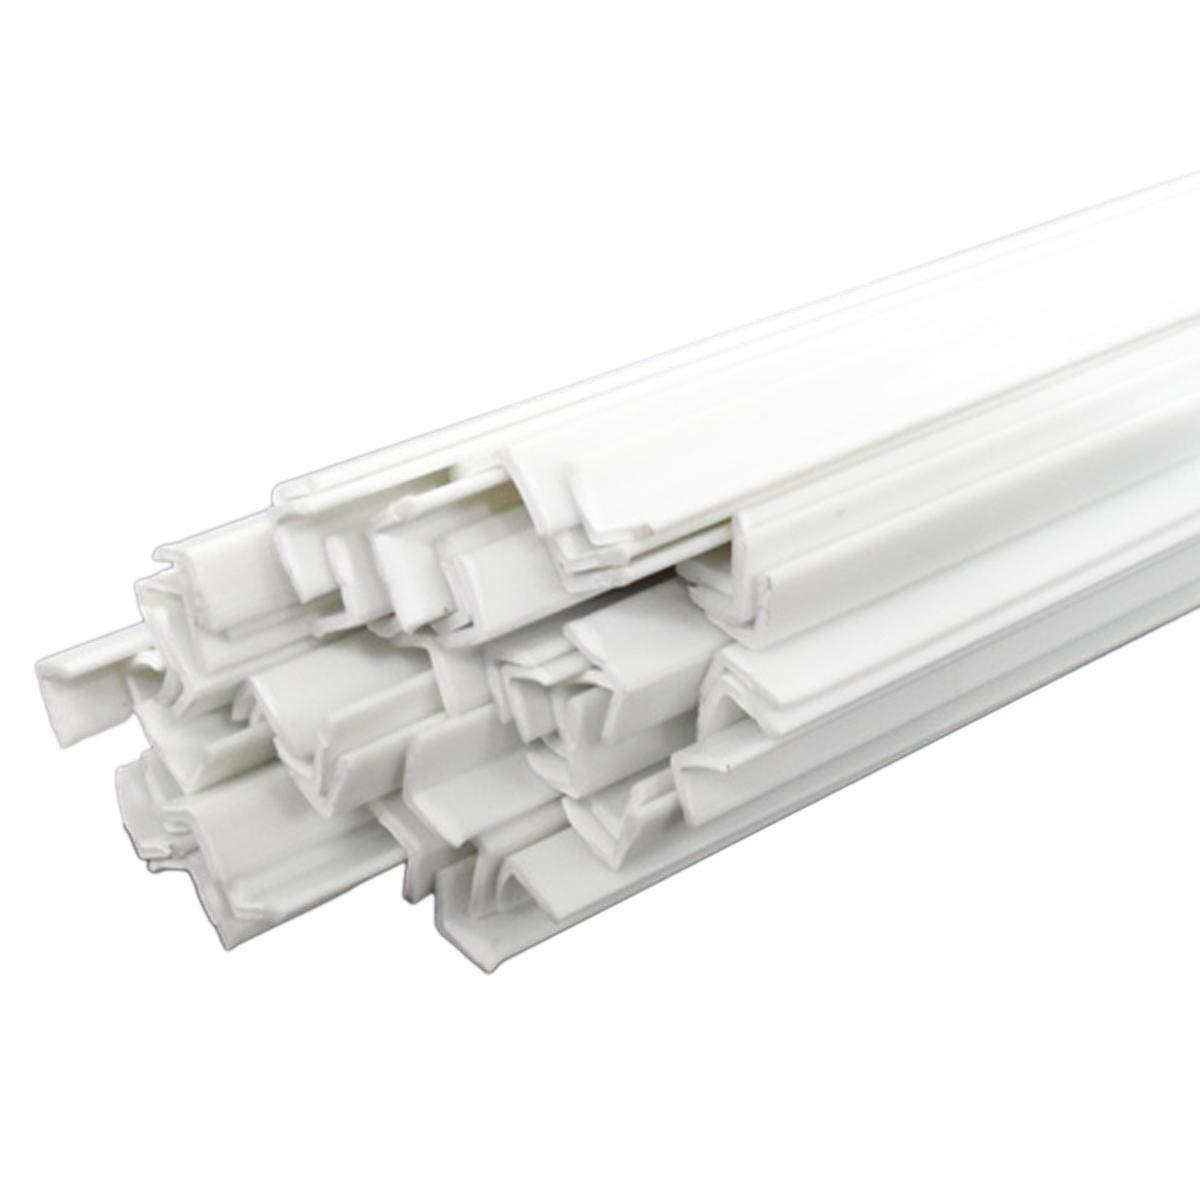 CGjiogujio 20pcs 4 x 250mm online shopping ABS Max 62% OFF L Right Shape Plastic Styrene